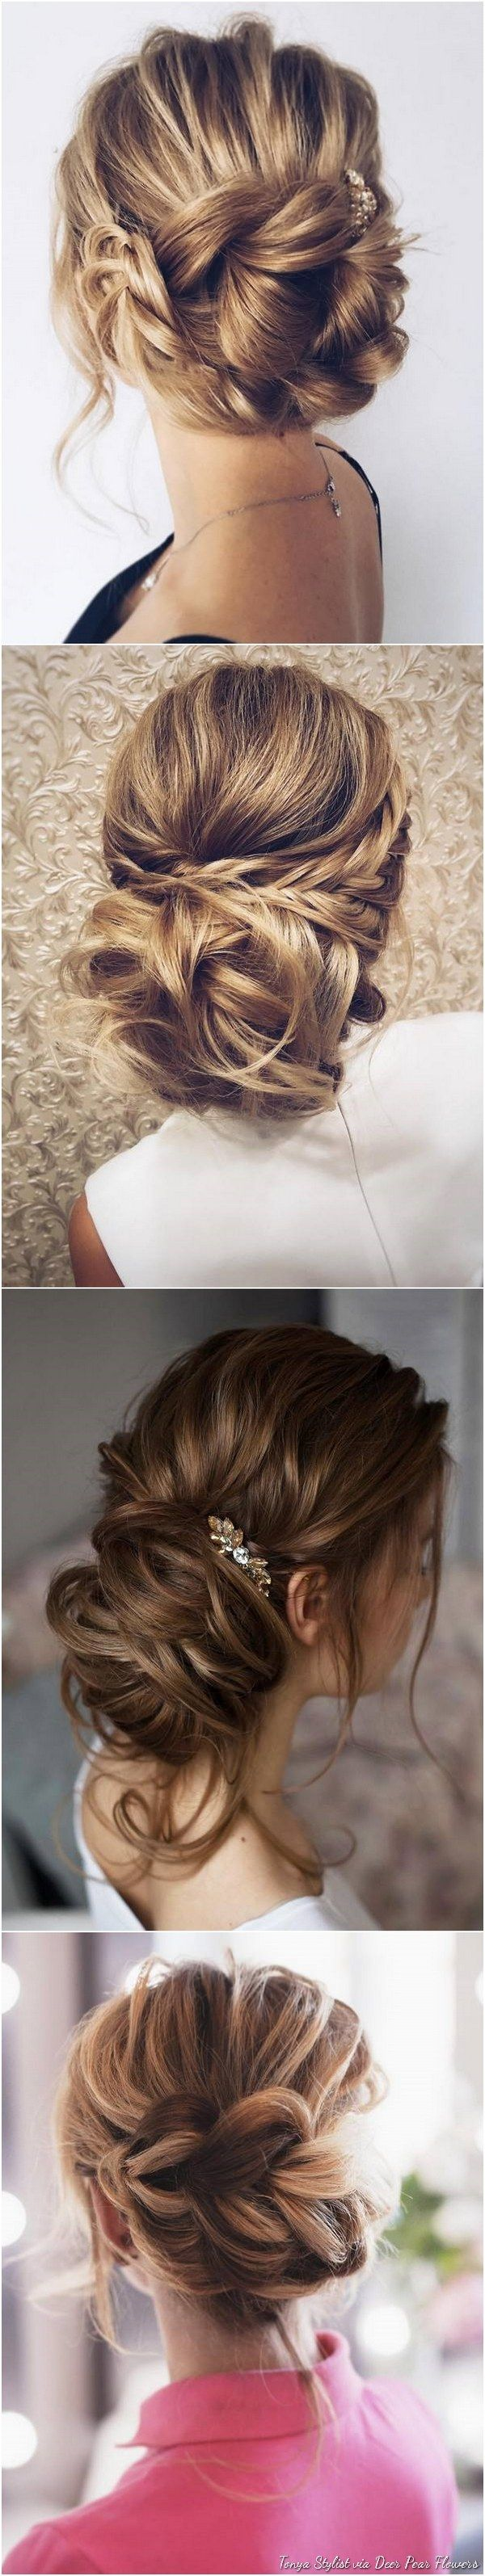 Peinados para Eventos especial o boda